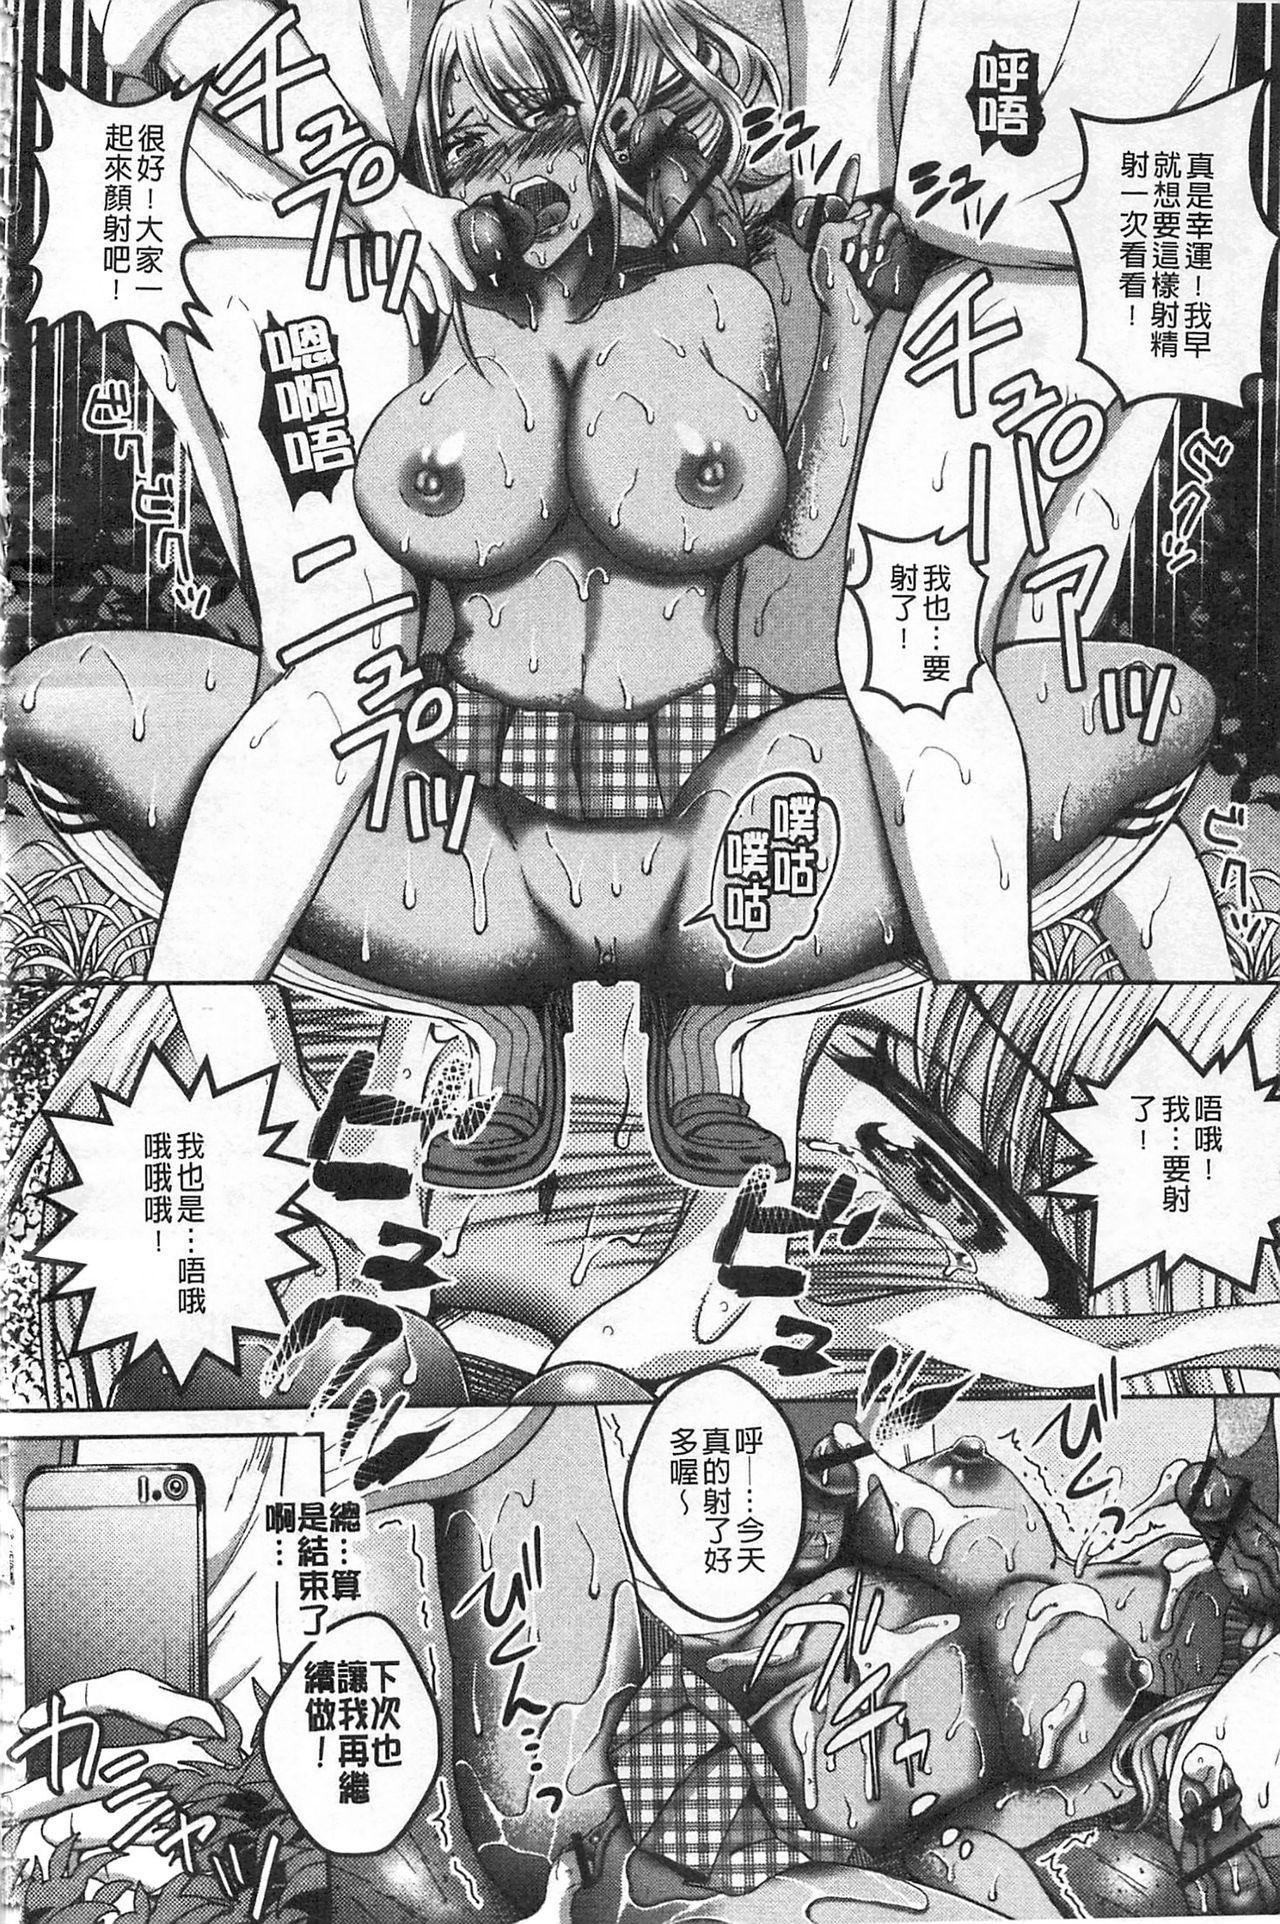 Kanjuku Otome no Odoshikata | 姦熟乙女的脅迫法 97